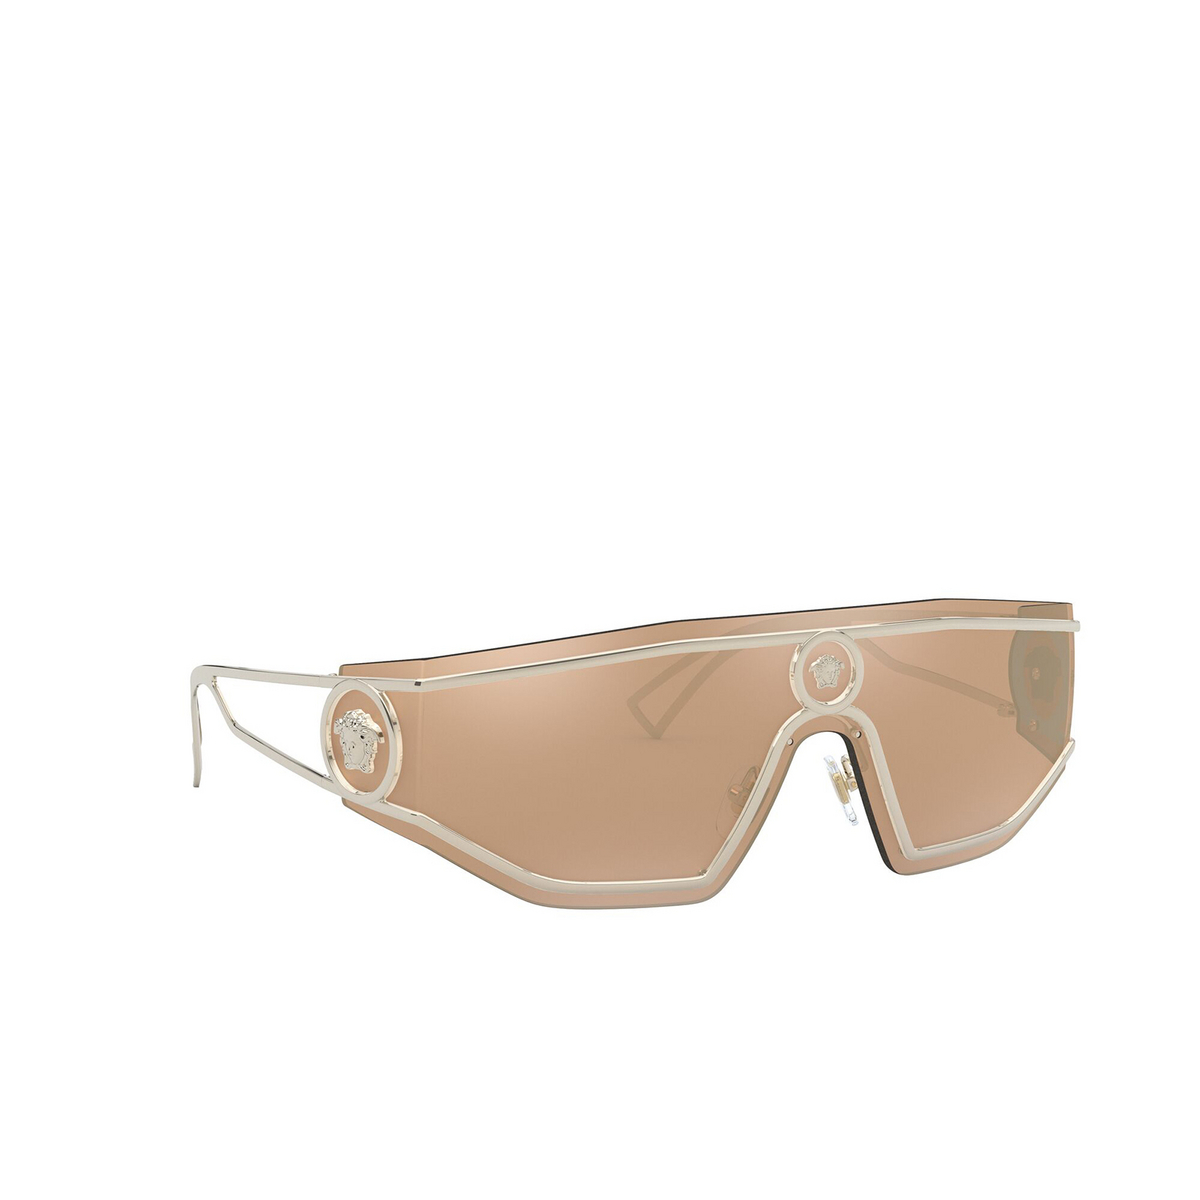 Versace® Mask Sunglasses: VE2226 color Pale Gold 12527P - three-quarters view.